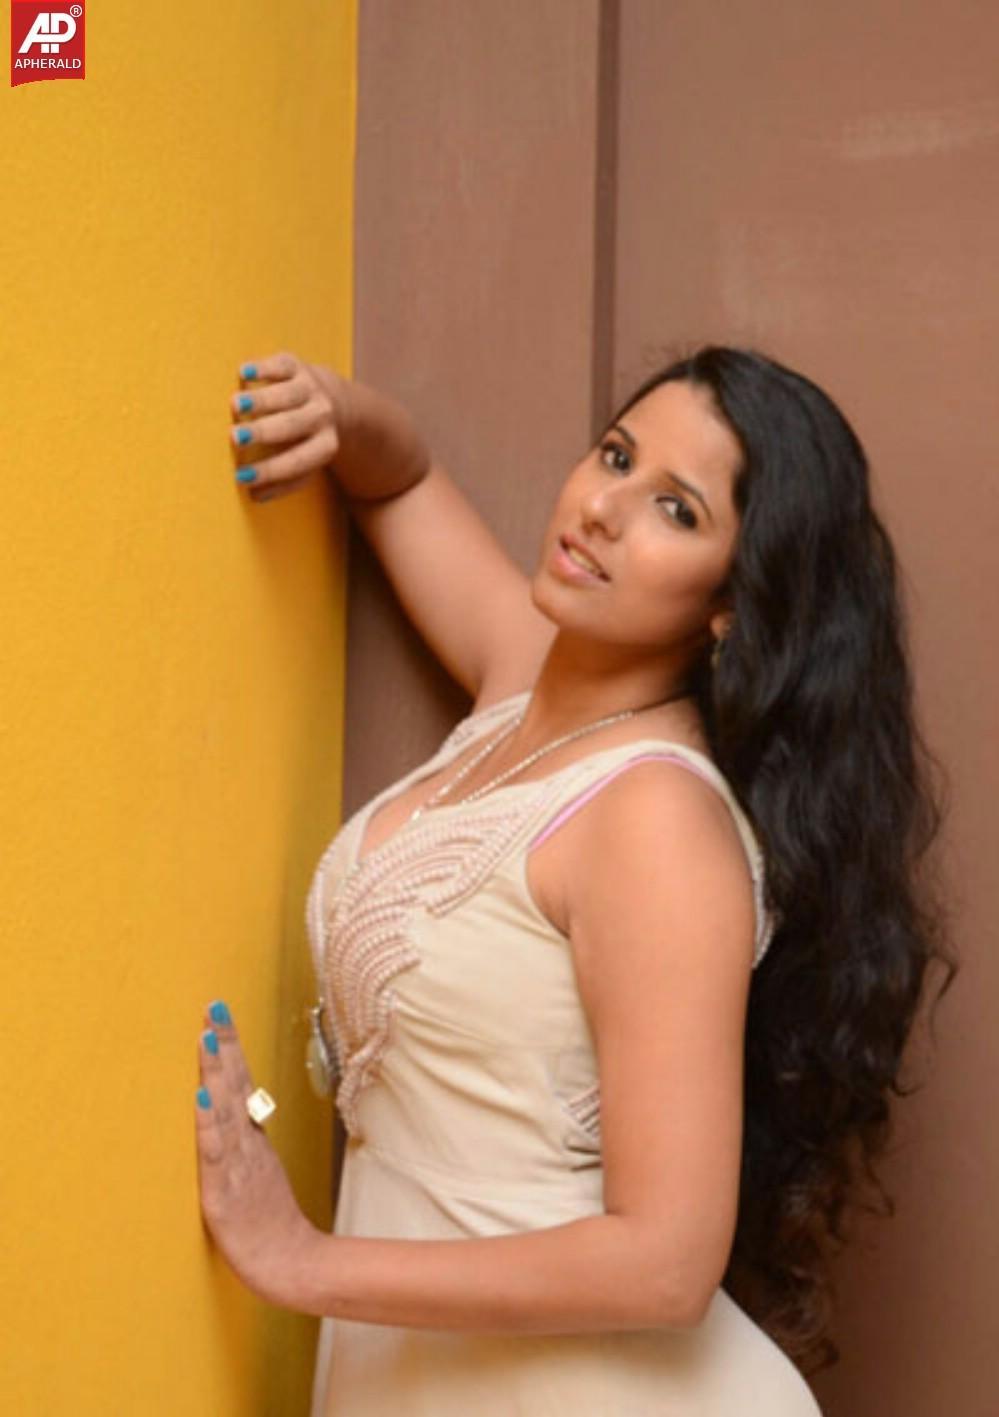 Indian Model and Actress Shravya Reddy Beautiful Exposing ...